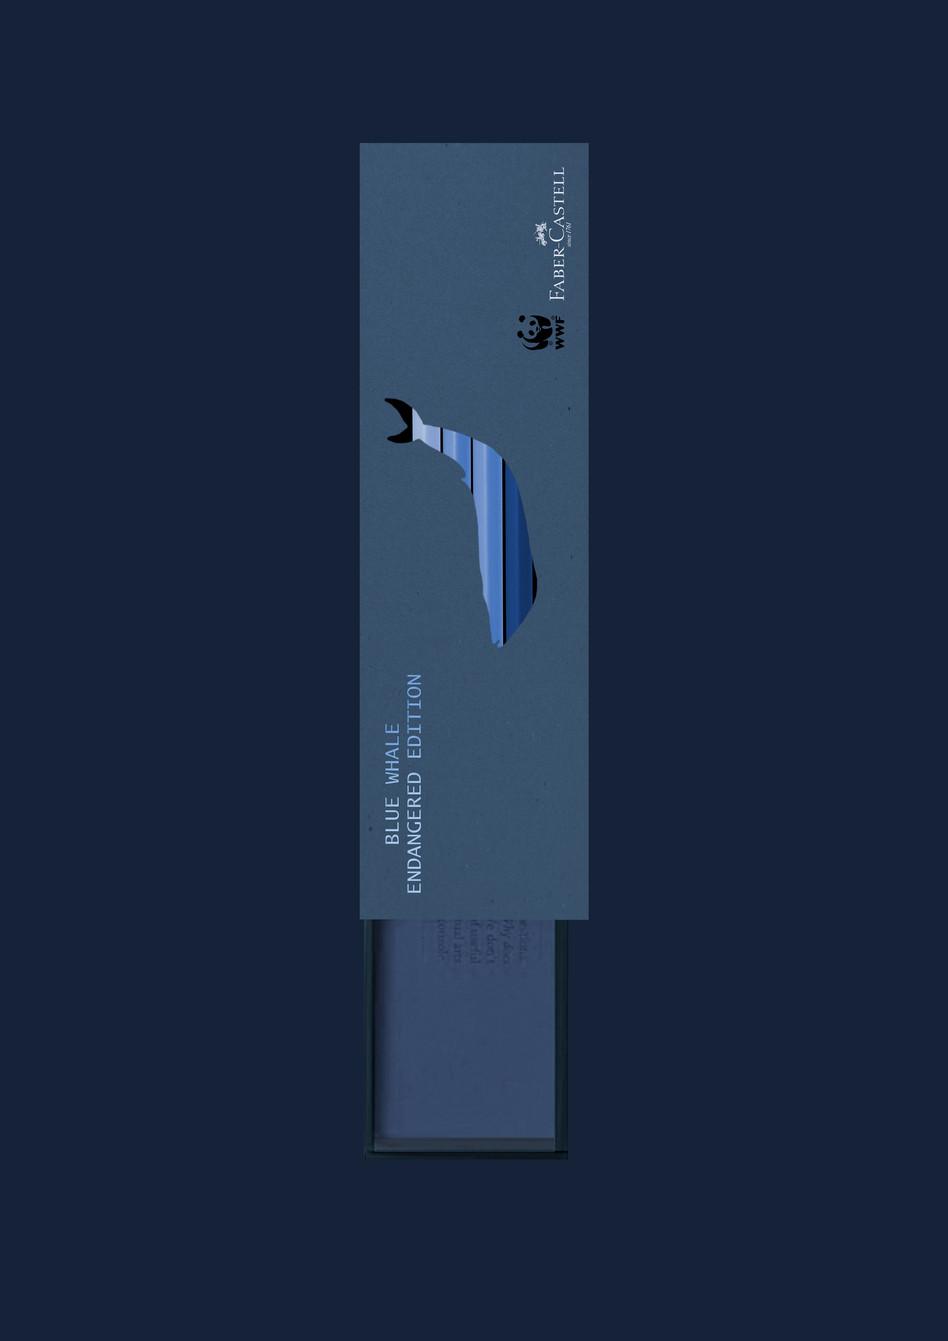 Blue wale